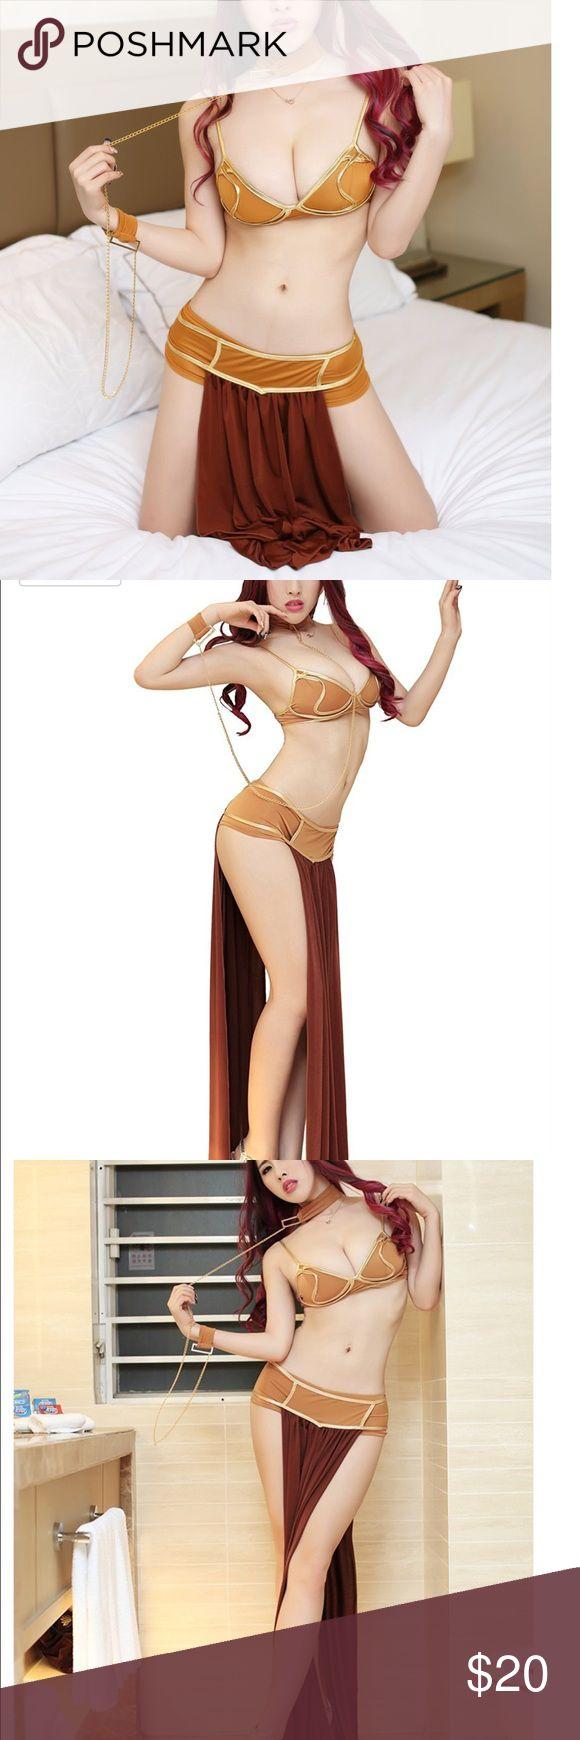 Prinzessin leia sklavin kostüm